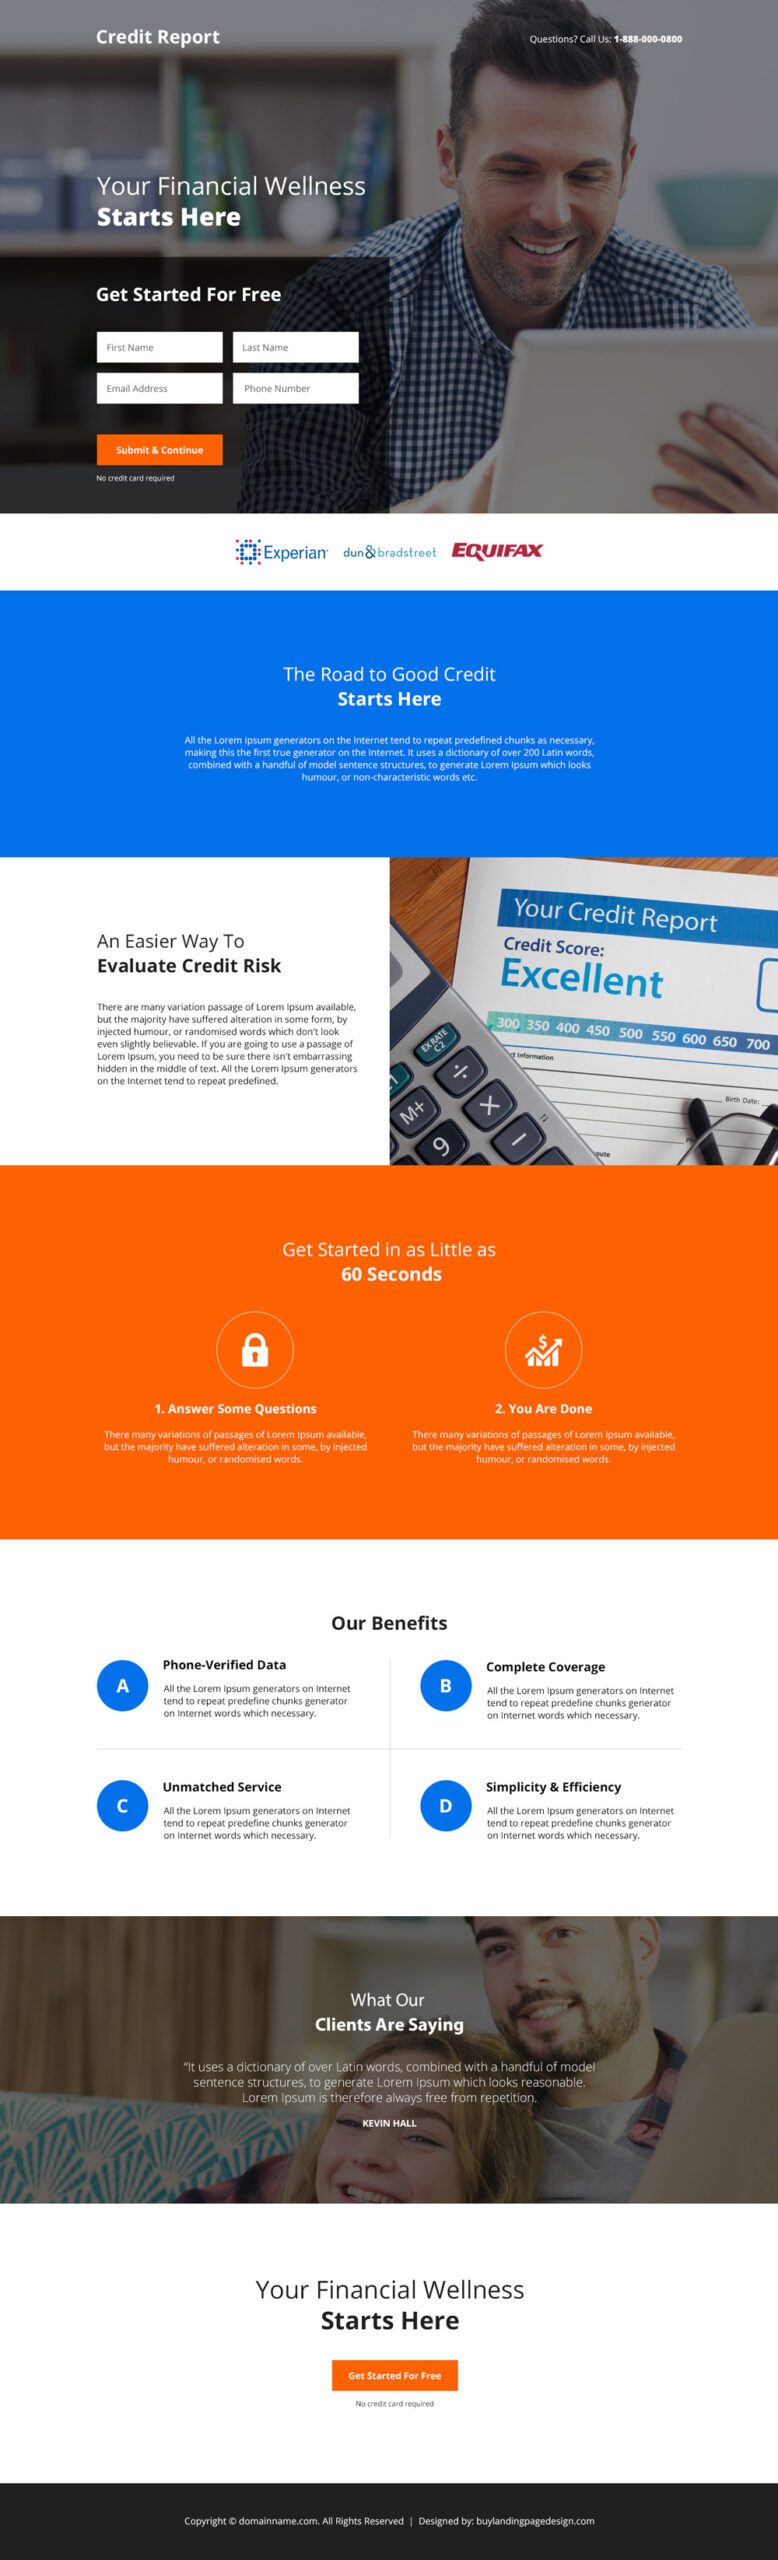 Credit reporting agencies responsive landing page